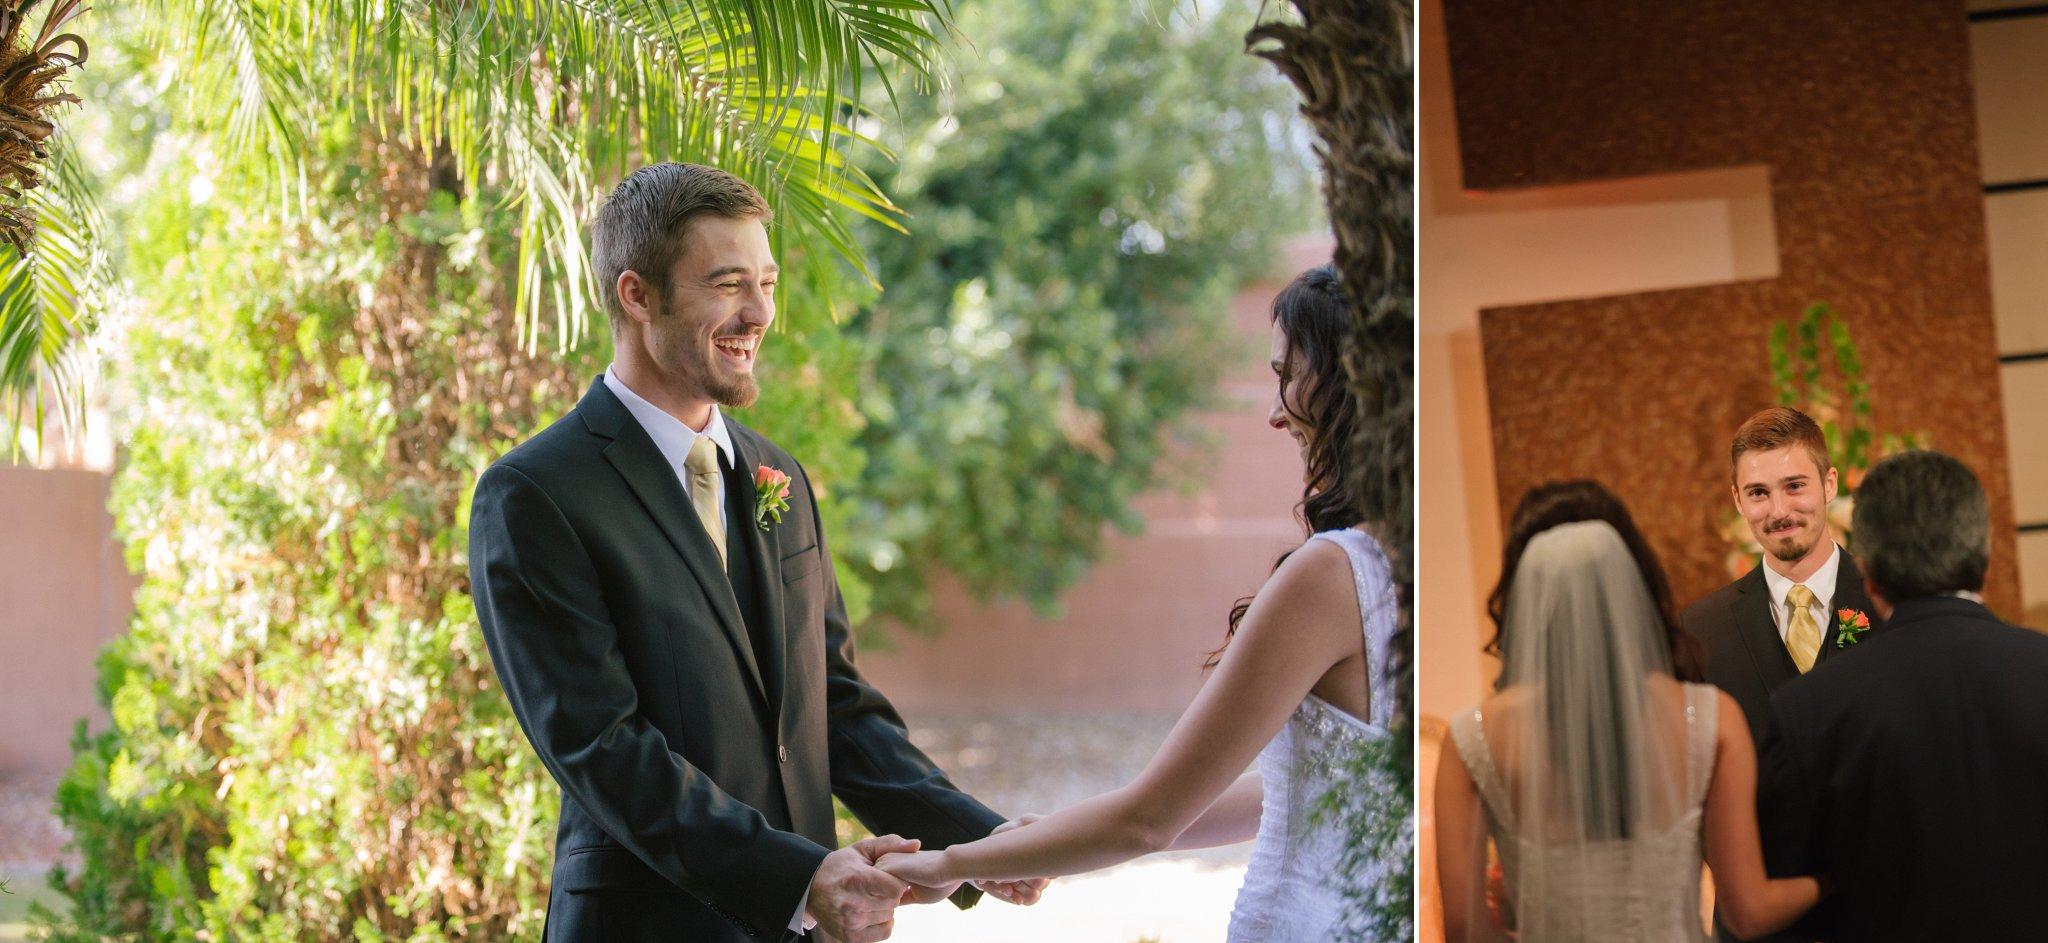 Arizona wedding groom seeing bride